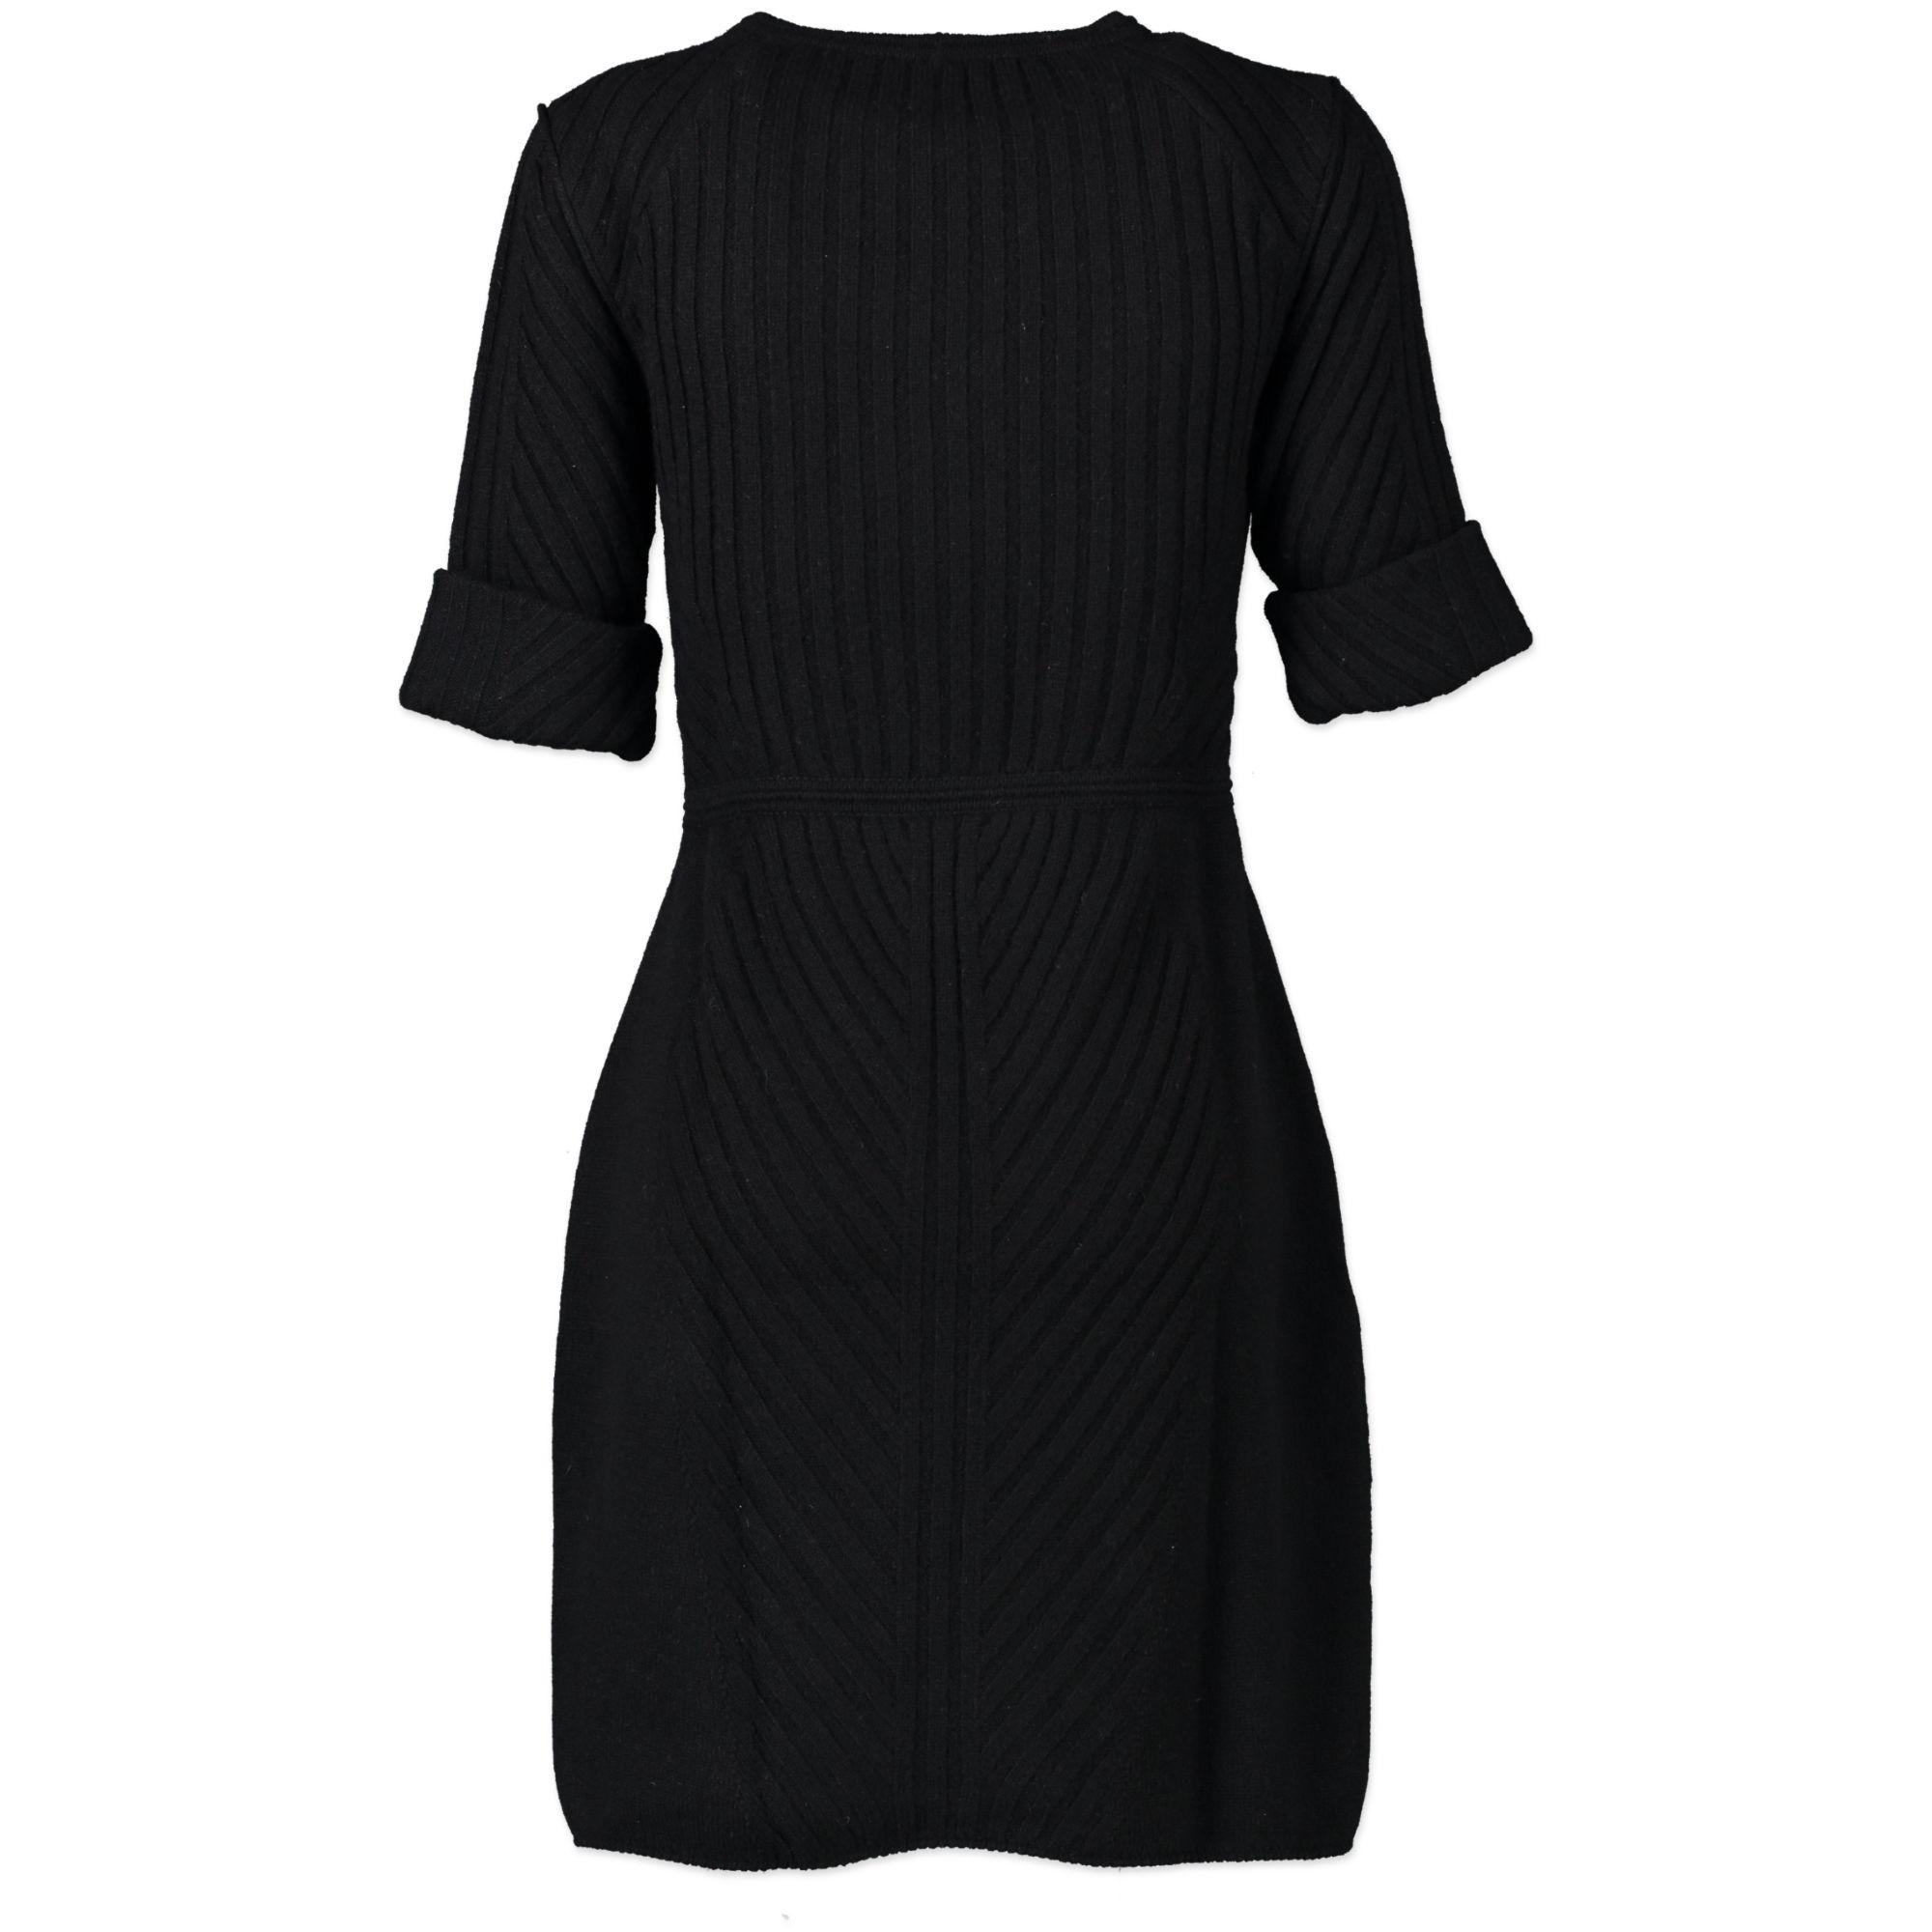 Fendi Cashmere Black Dress - size 38 - for sale online at Labellov